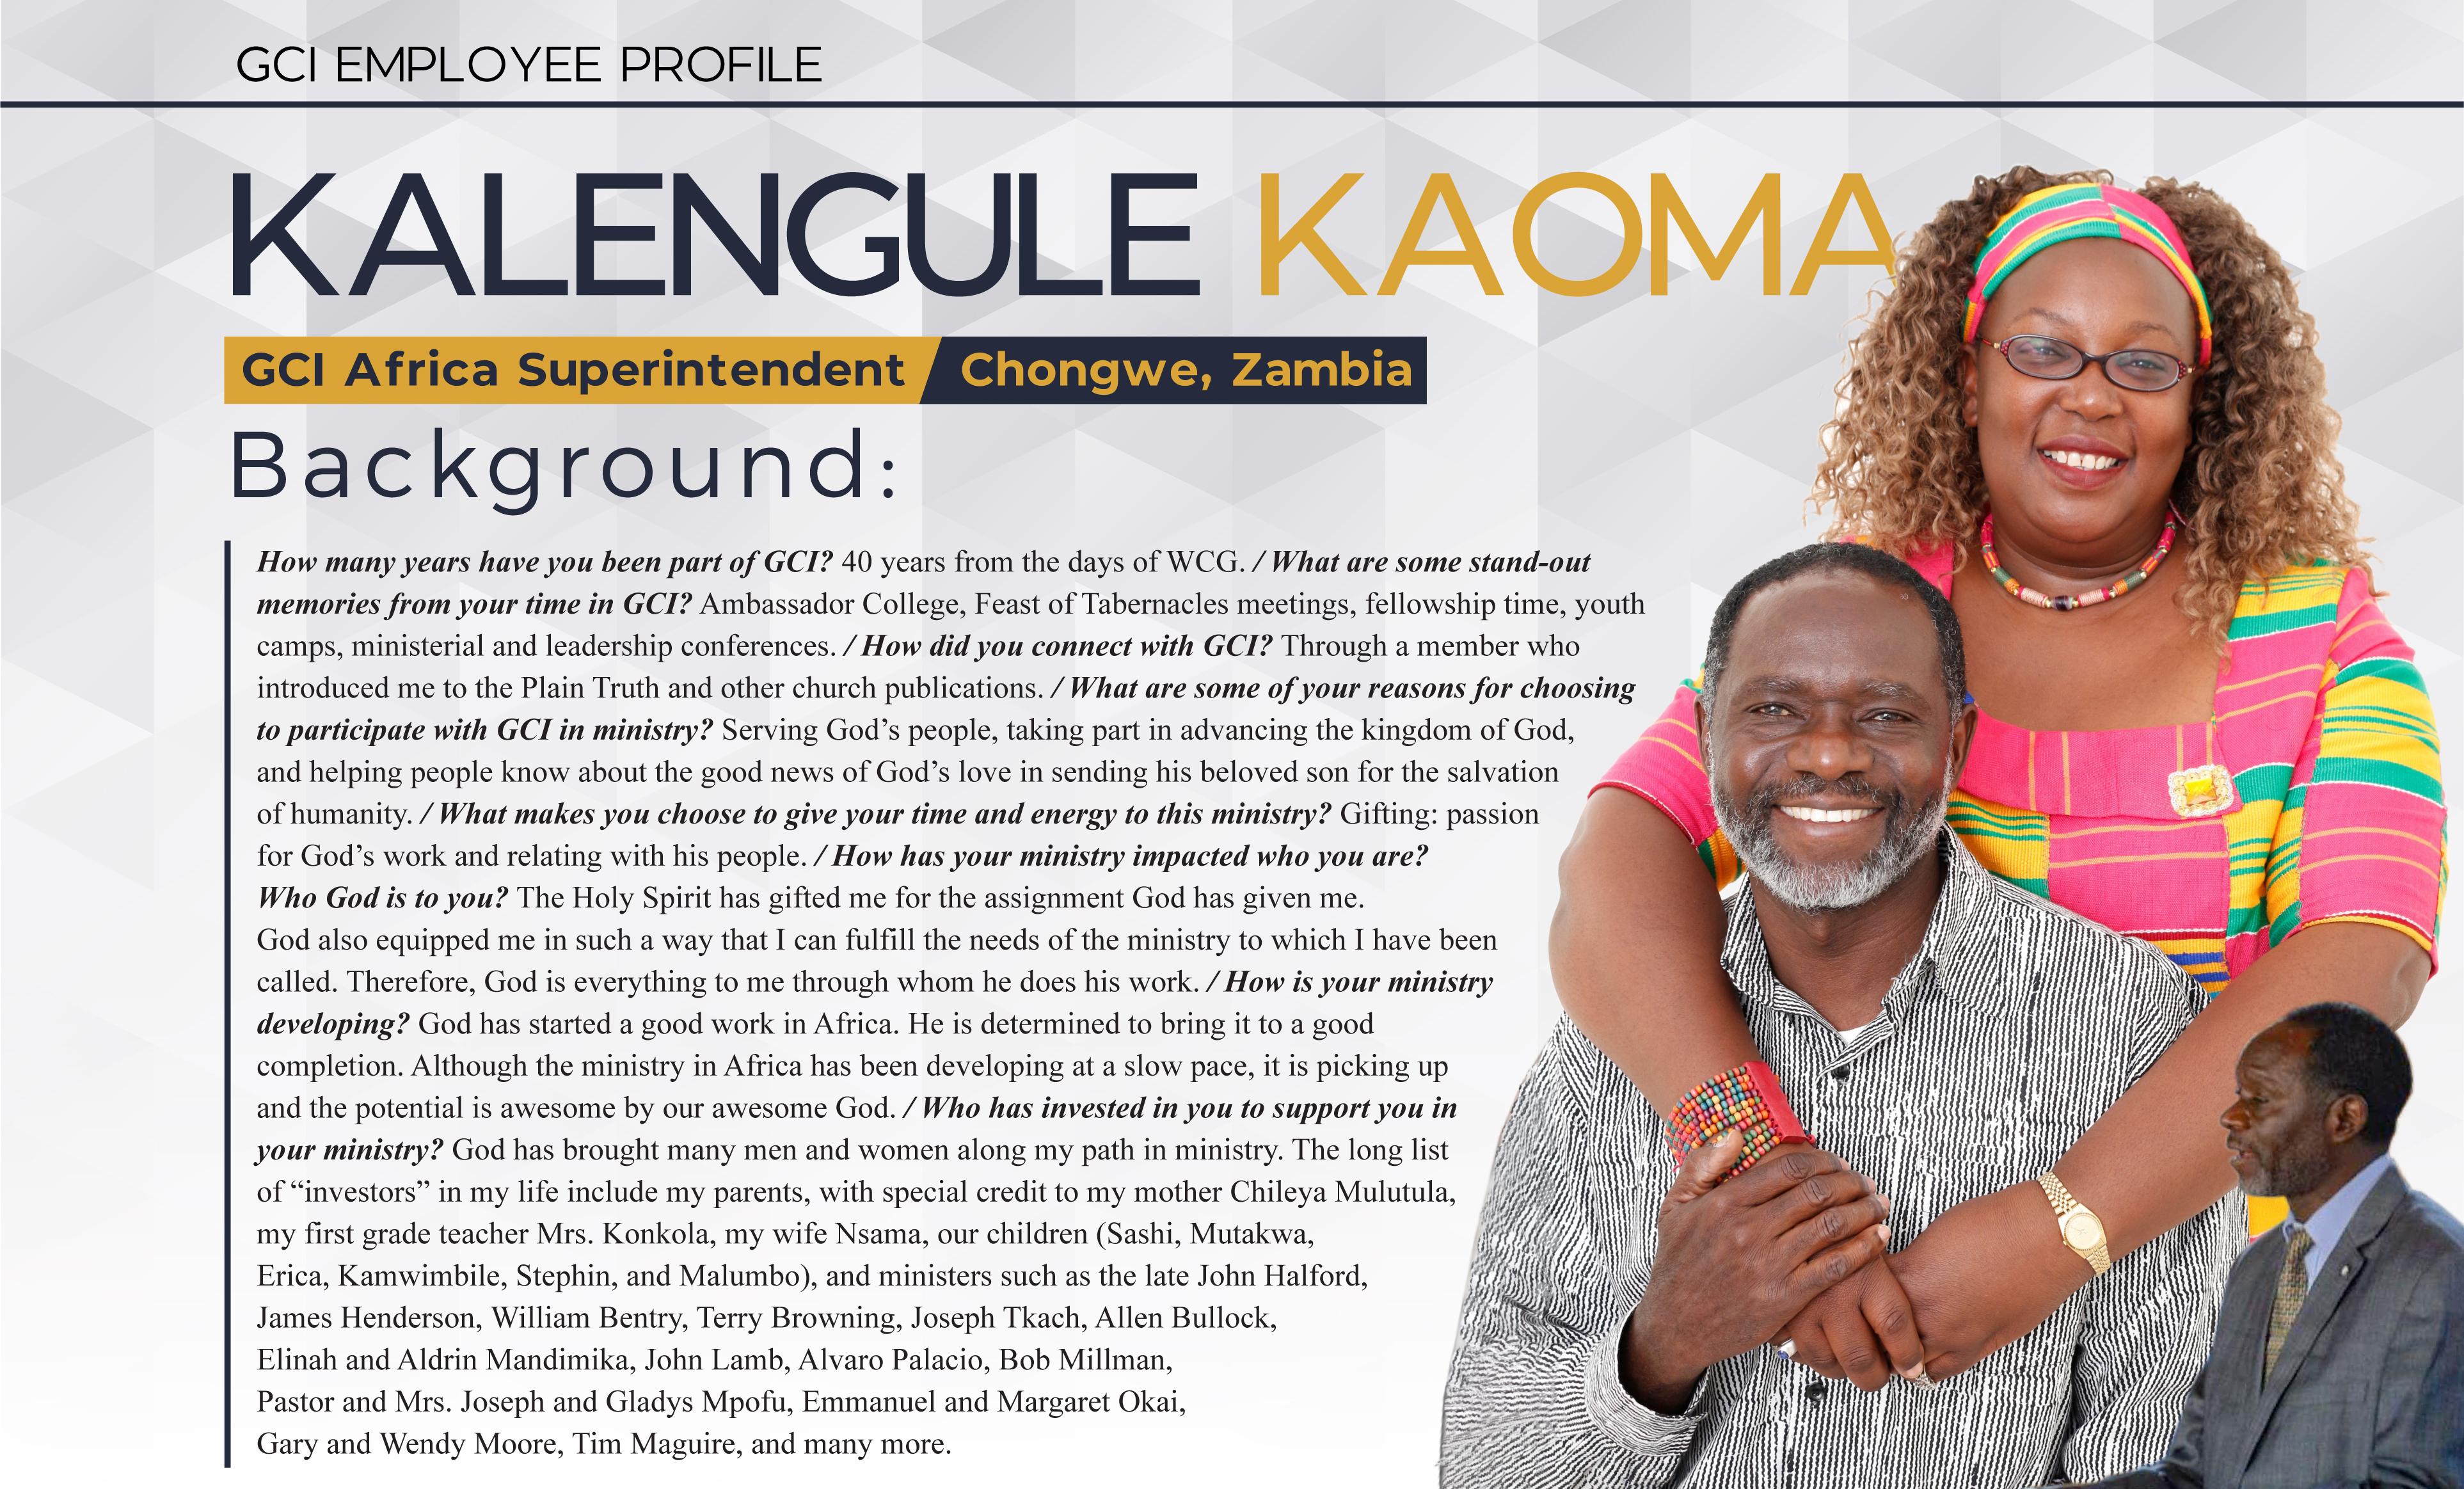 Kalengule Kaoma Profile